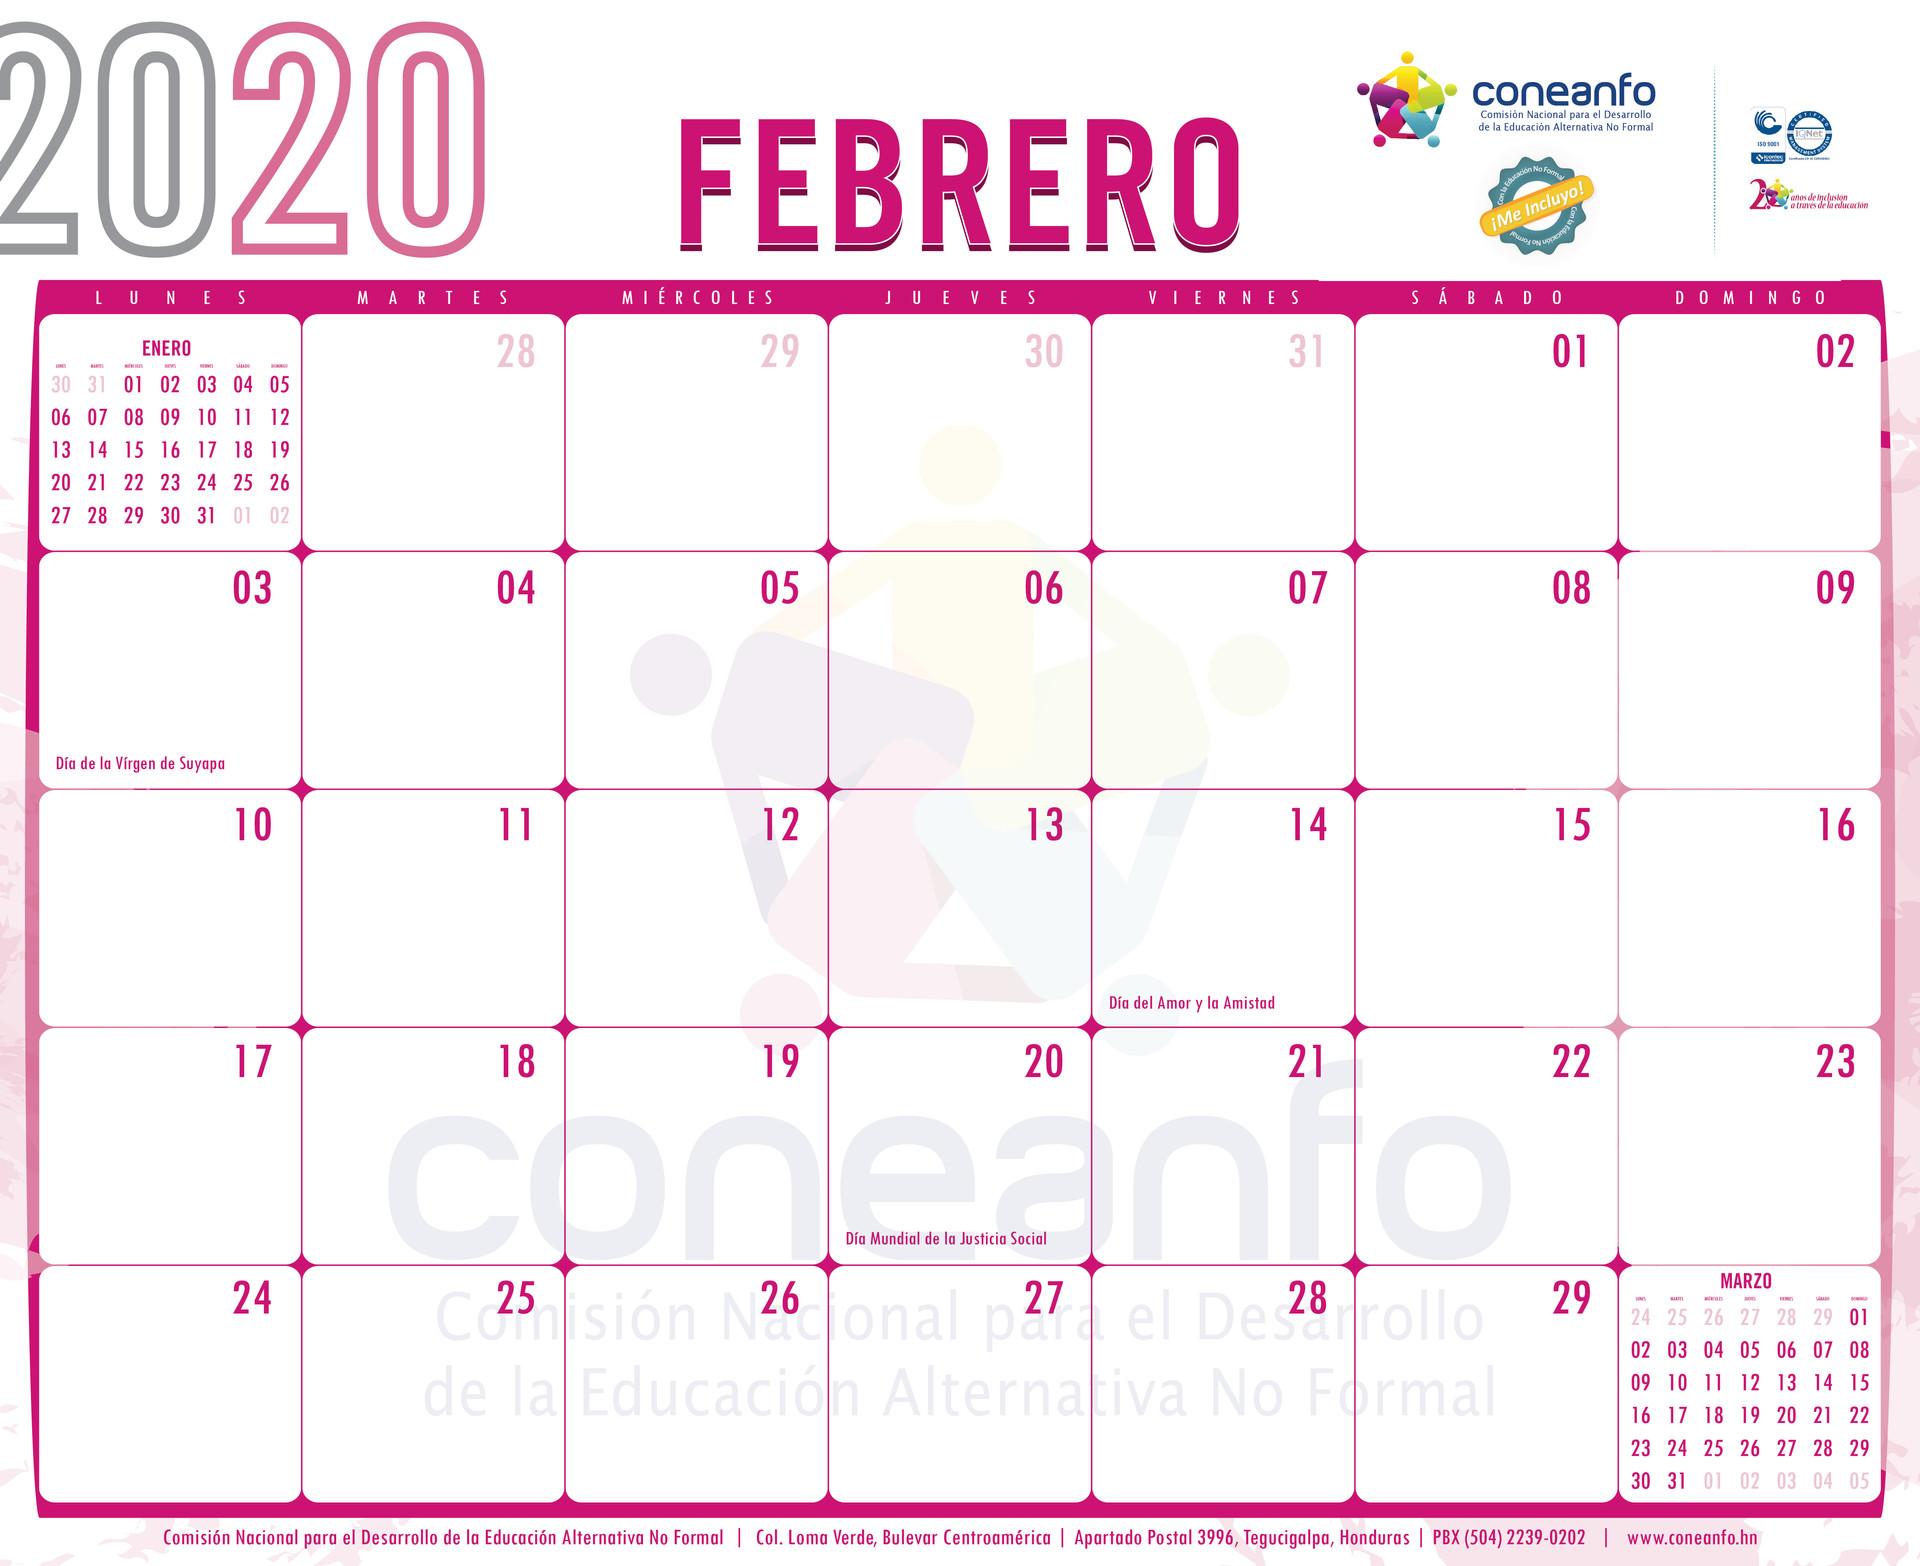 Calendario CONEANFO-02.jpg